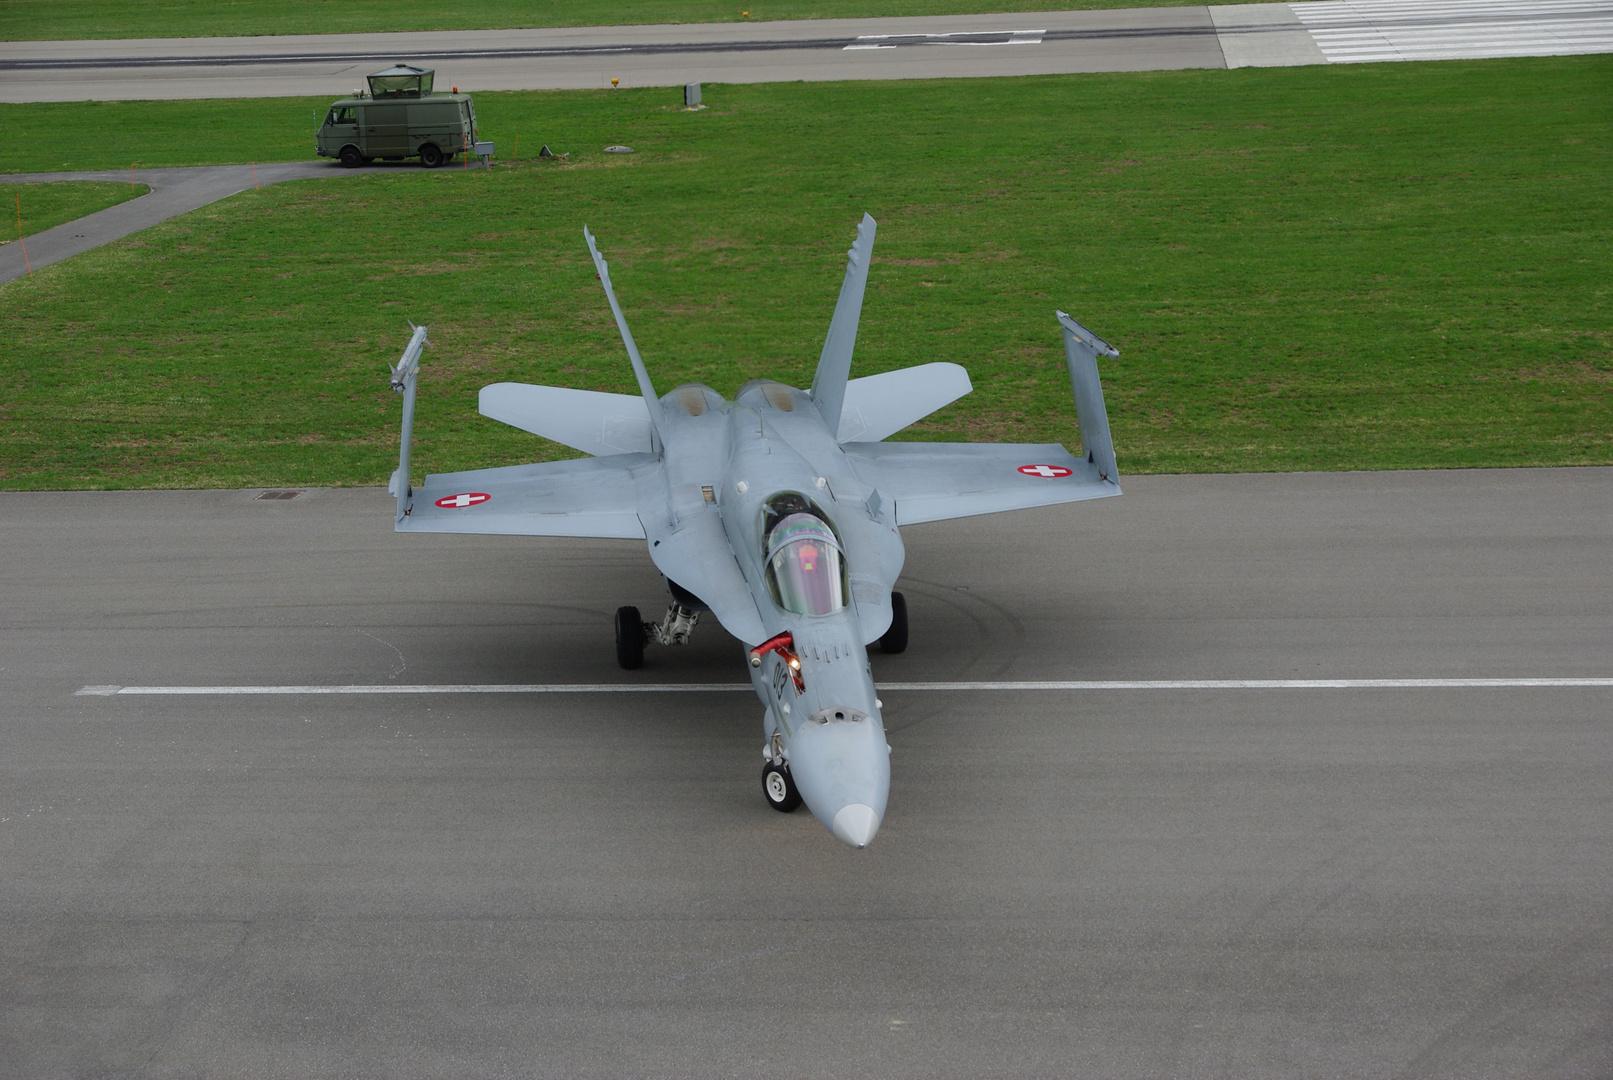 F-18 Air Base Meiringen Schweiz nach der Landung